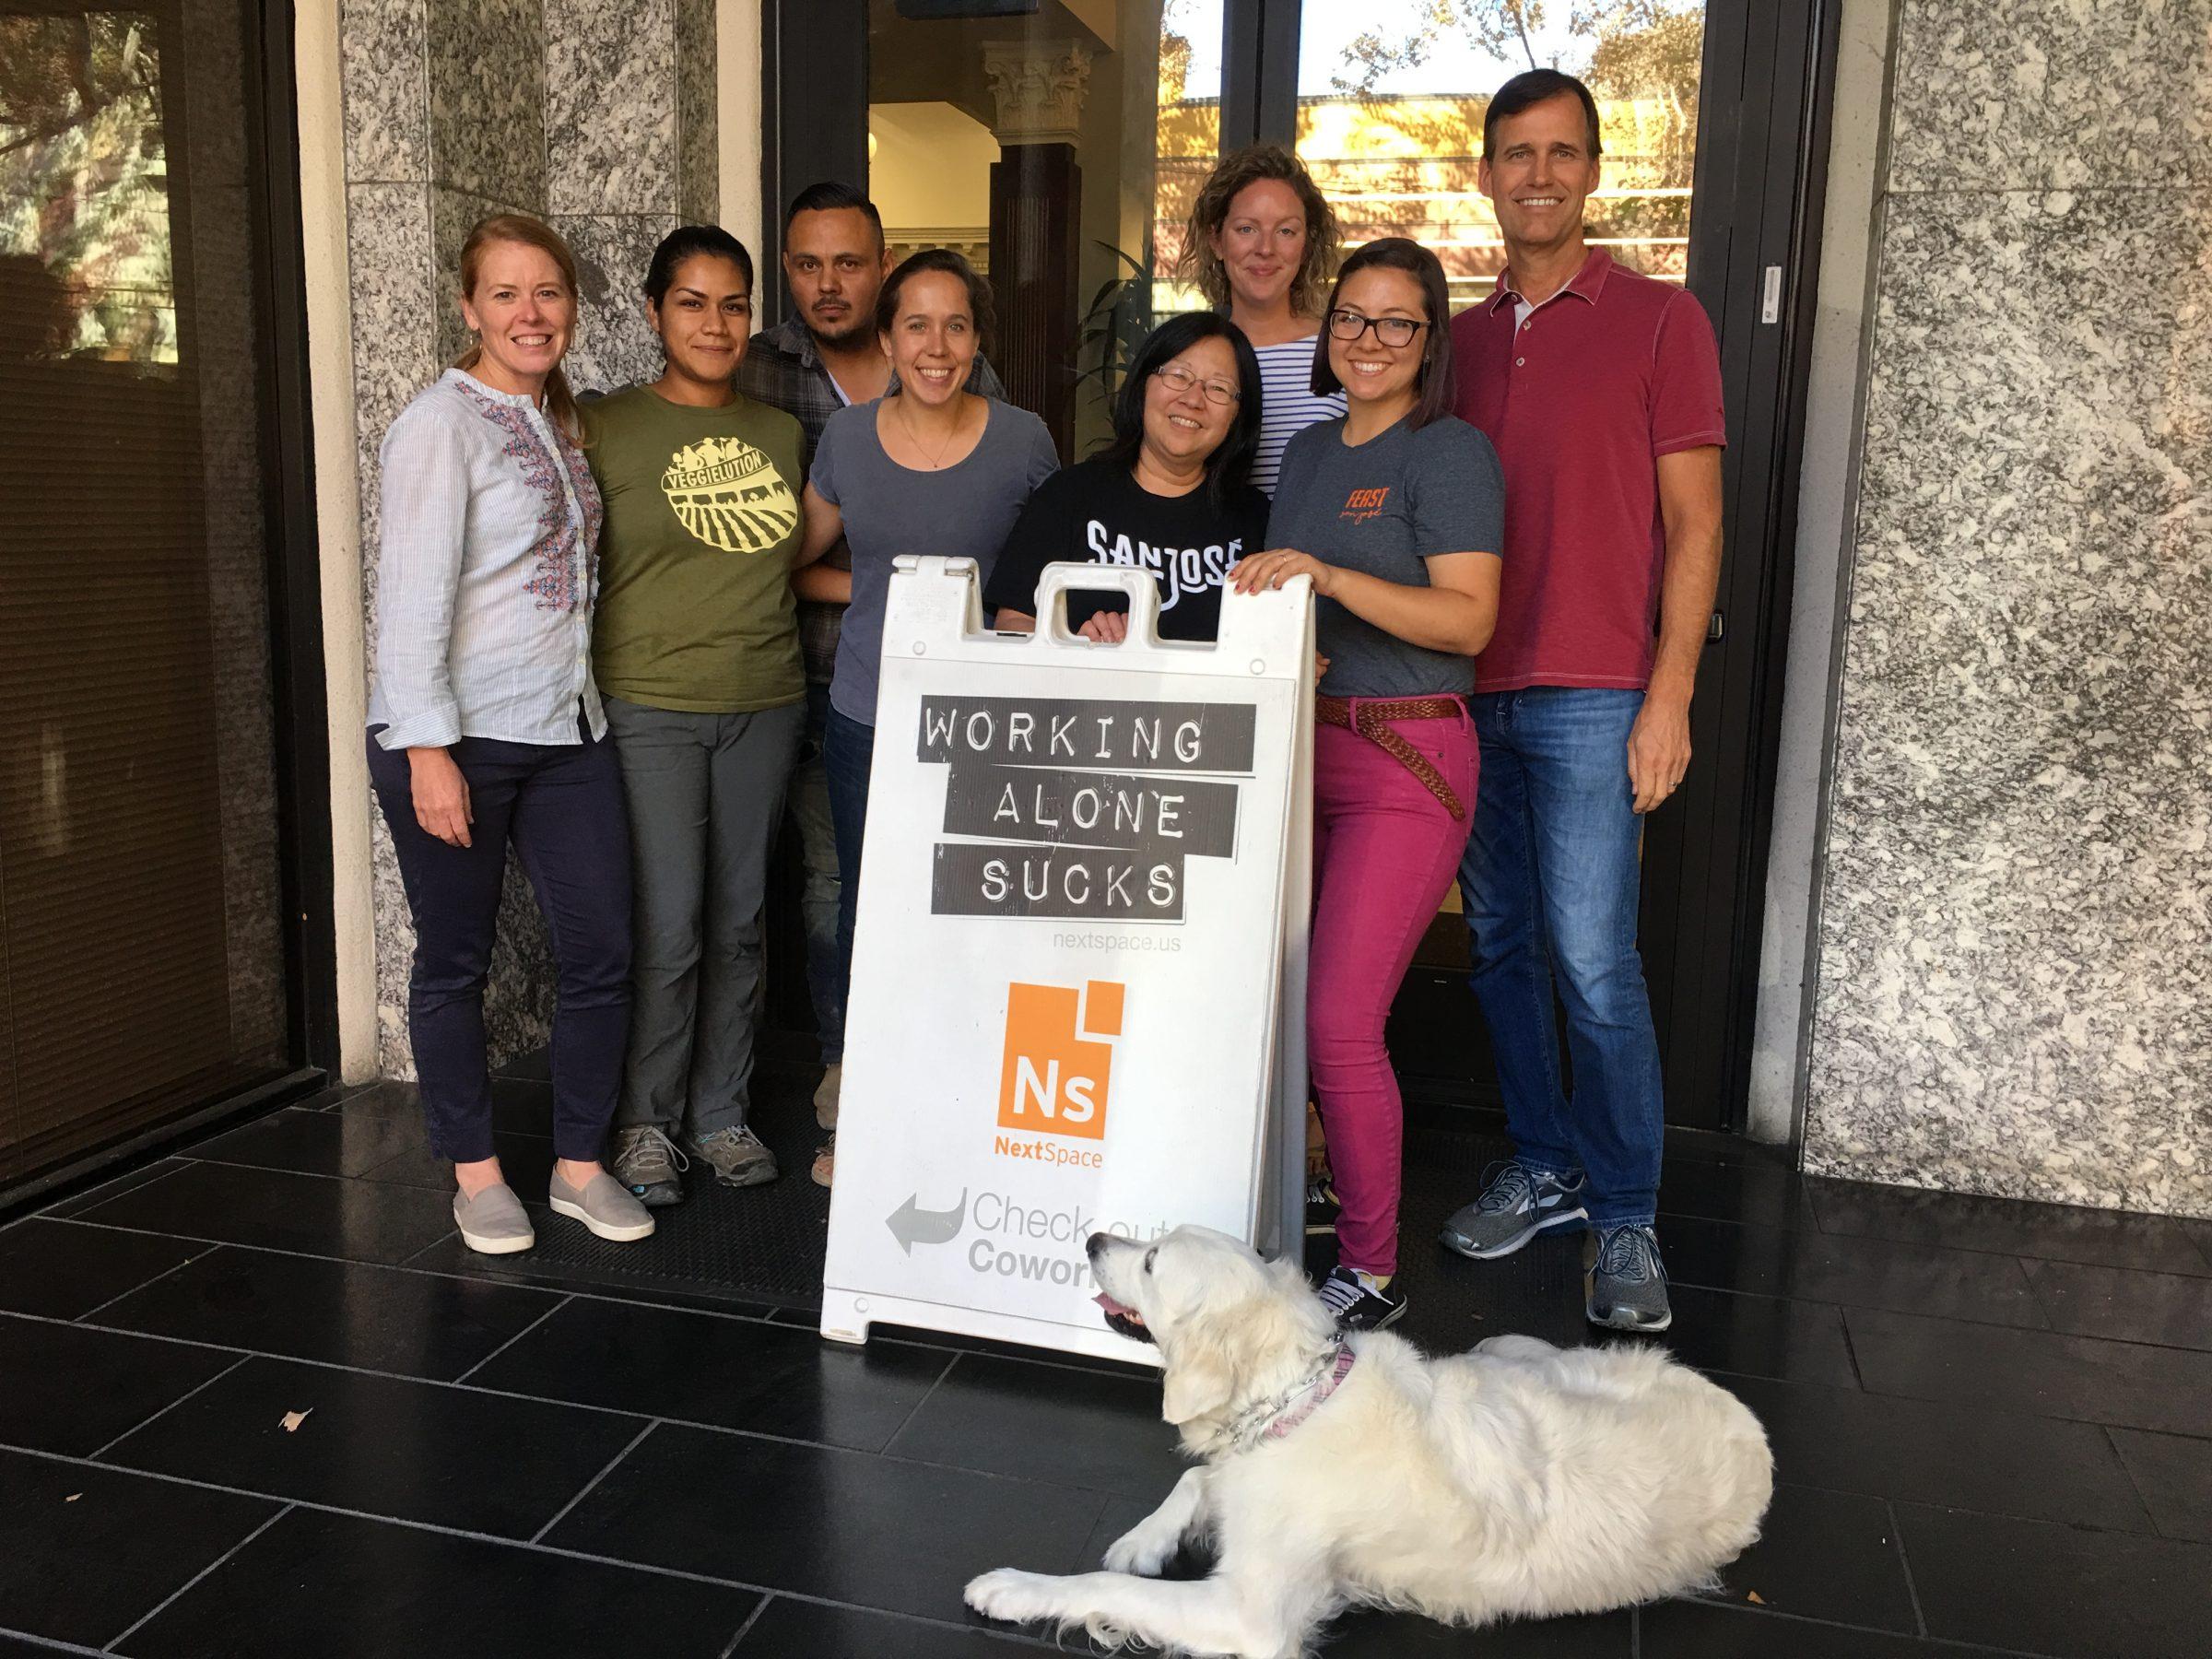 Urban community farm, Veggielution, finds donated workspace at NextSpace San Jose